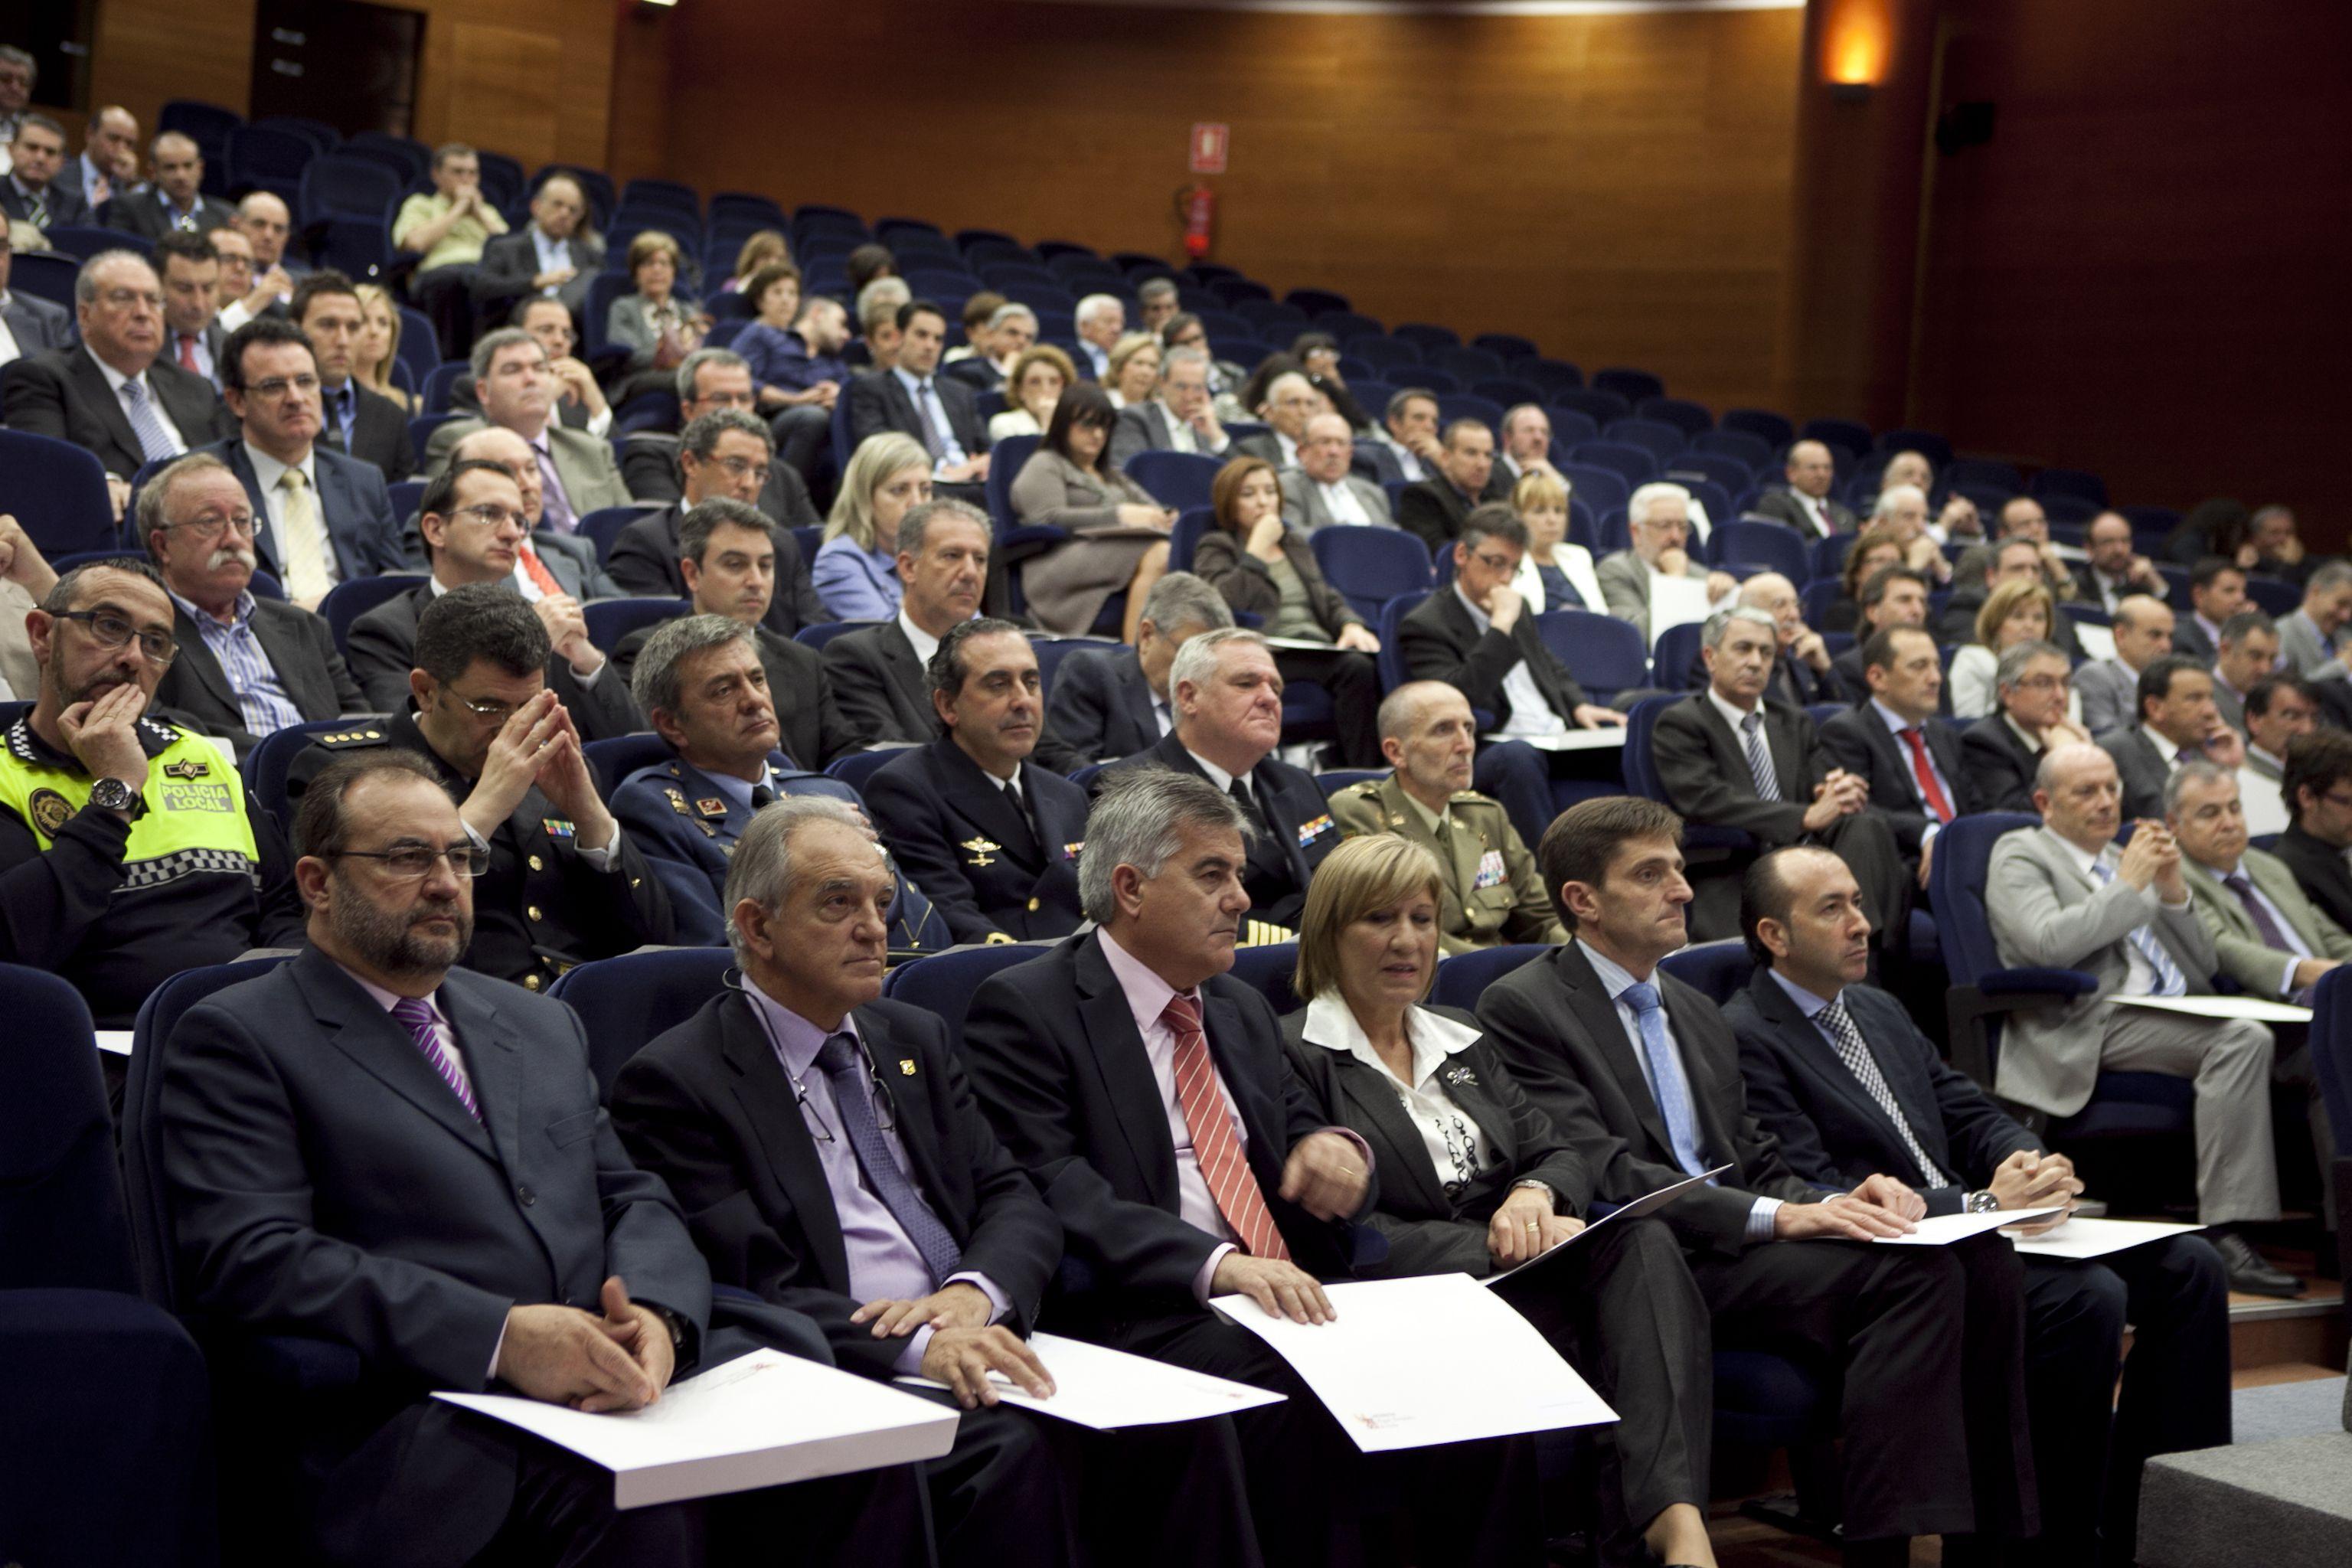 umh-diplomas-rector_mg_7068.jpg